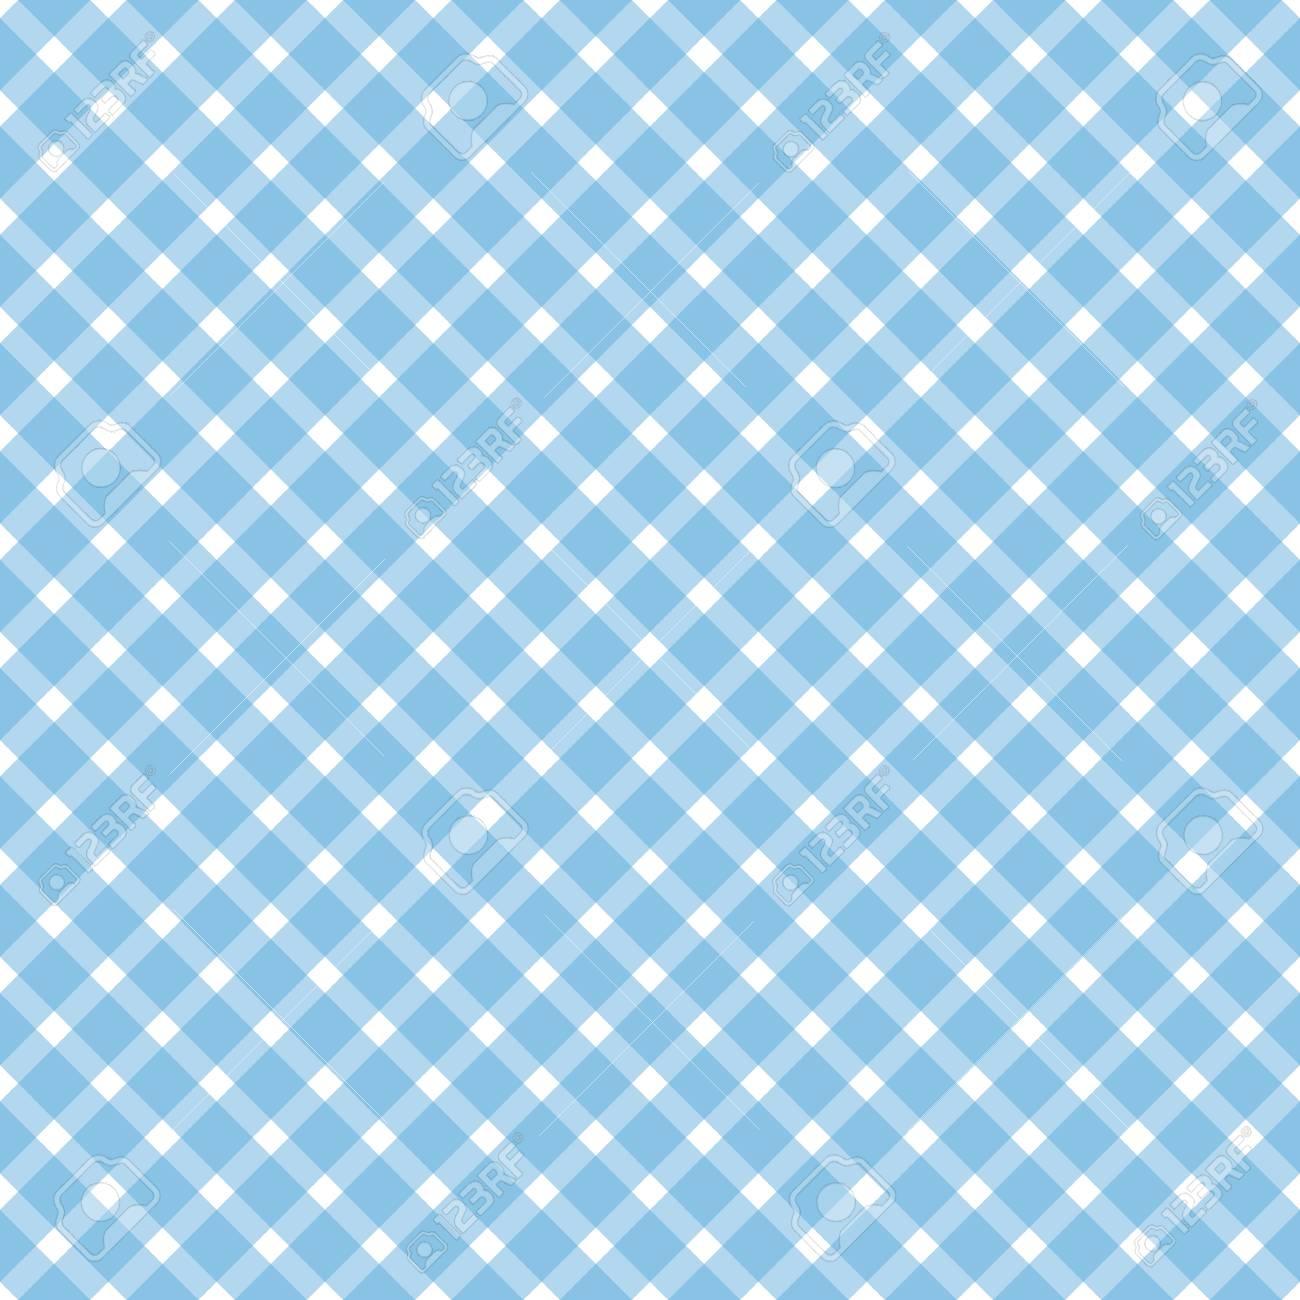 Oktoberfest Background With Seamless Blue White Checkered Pattern 1300x1300